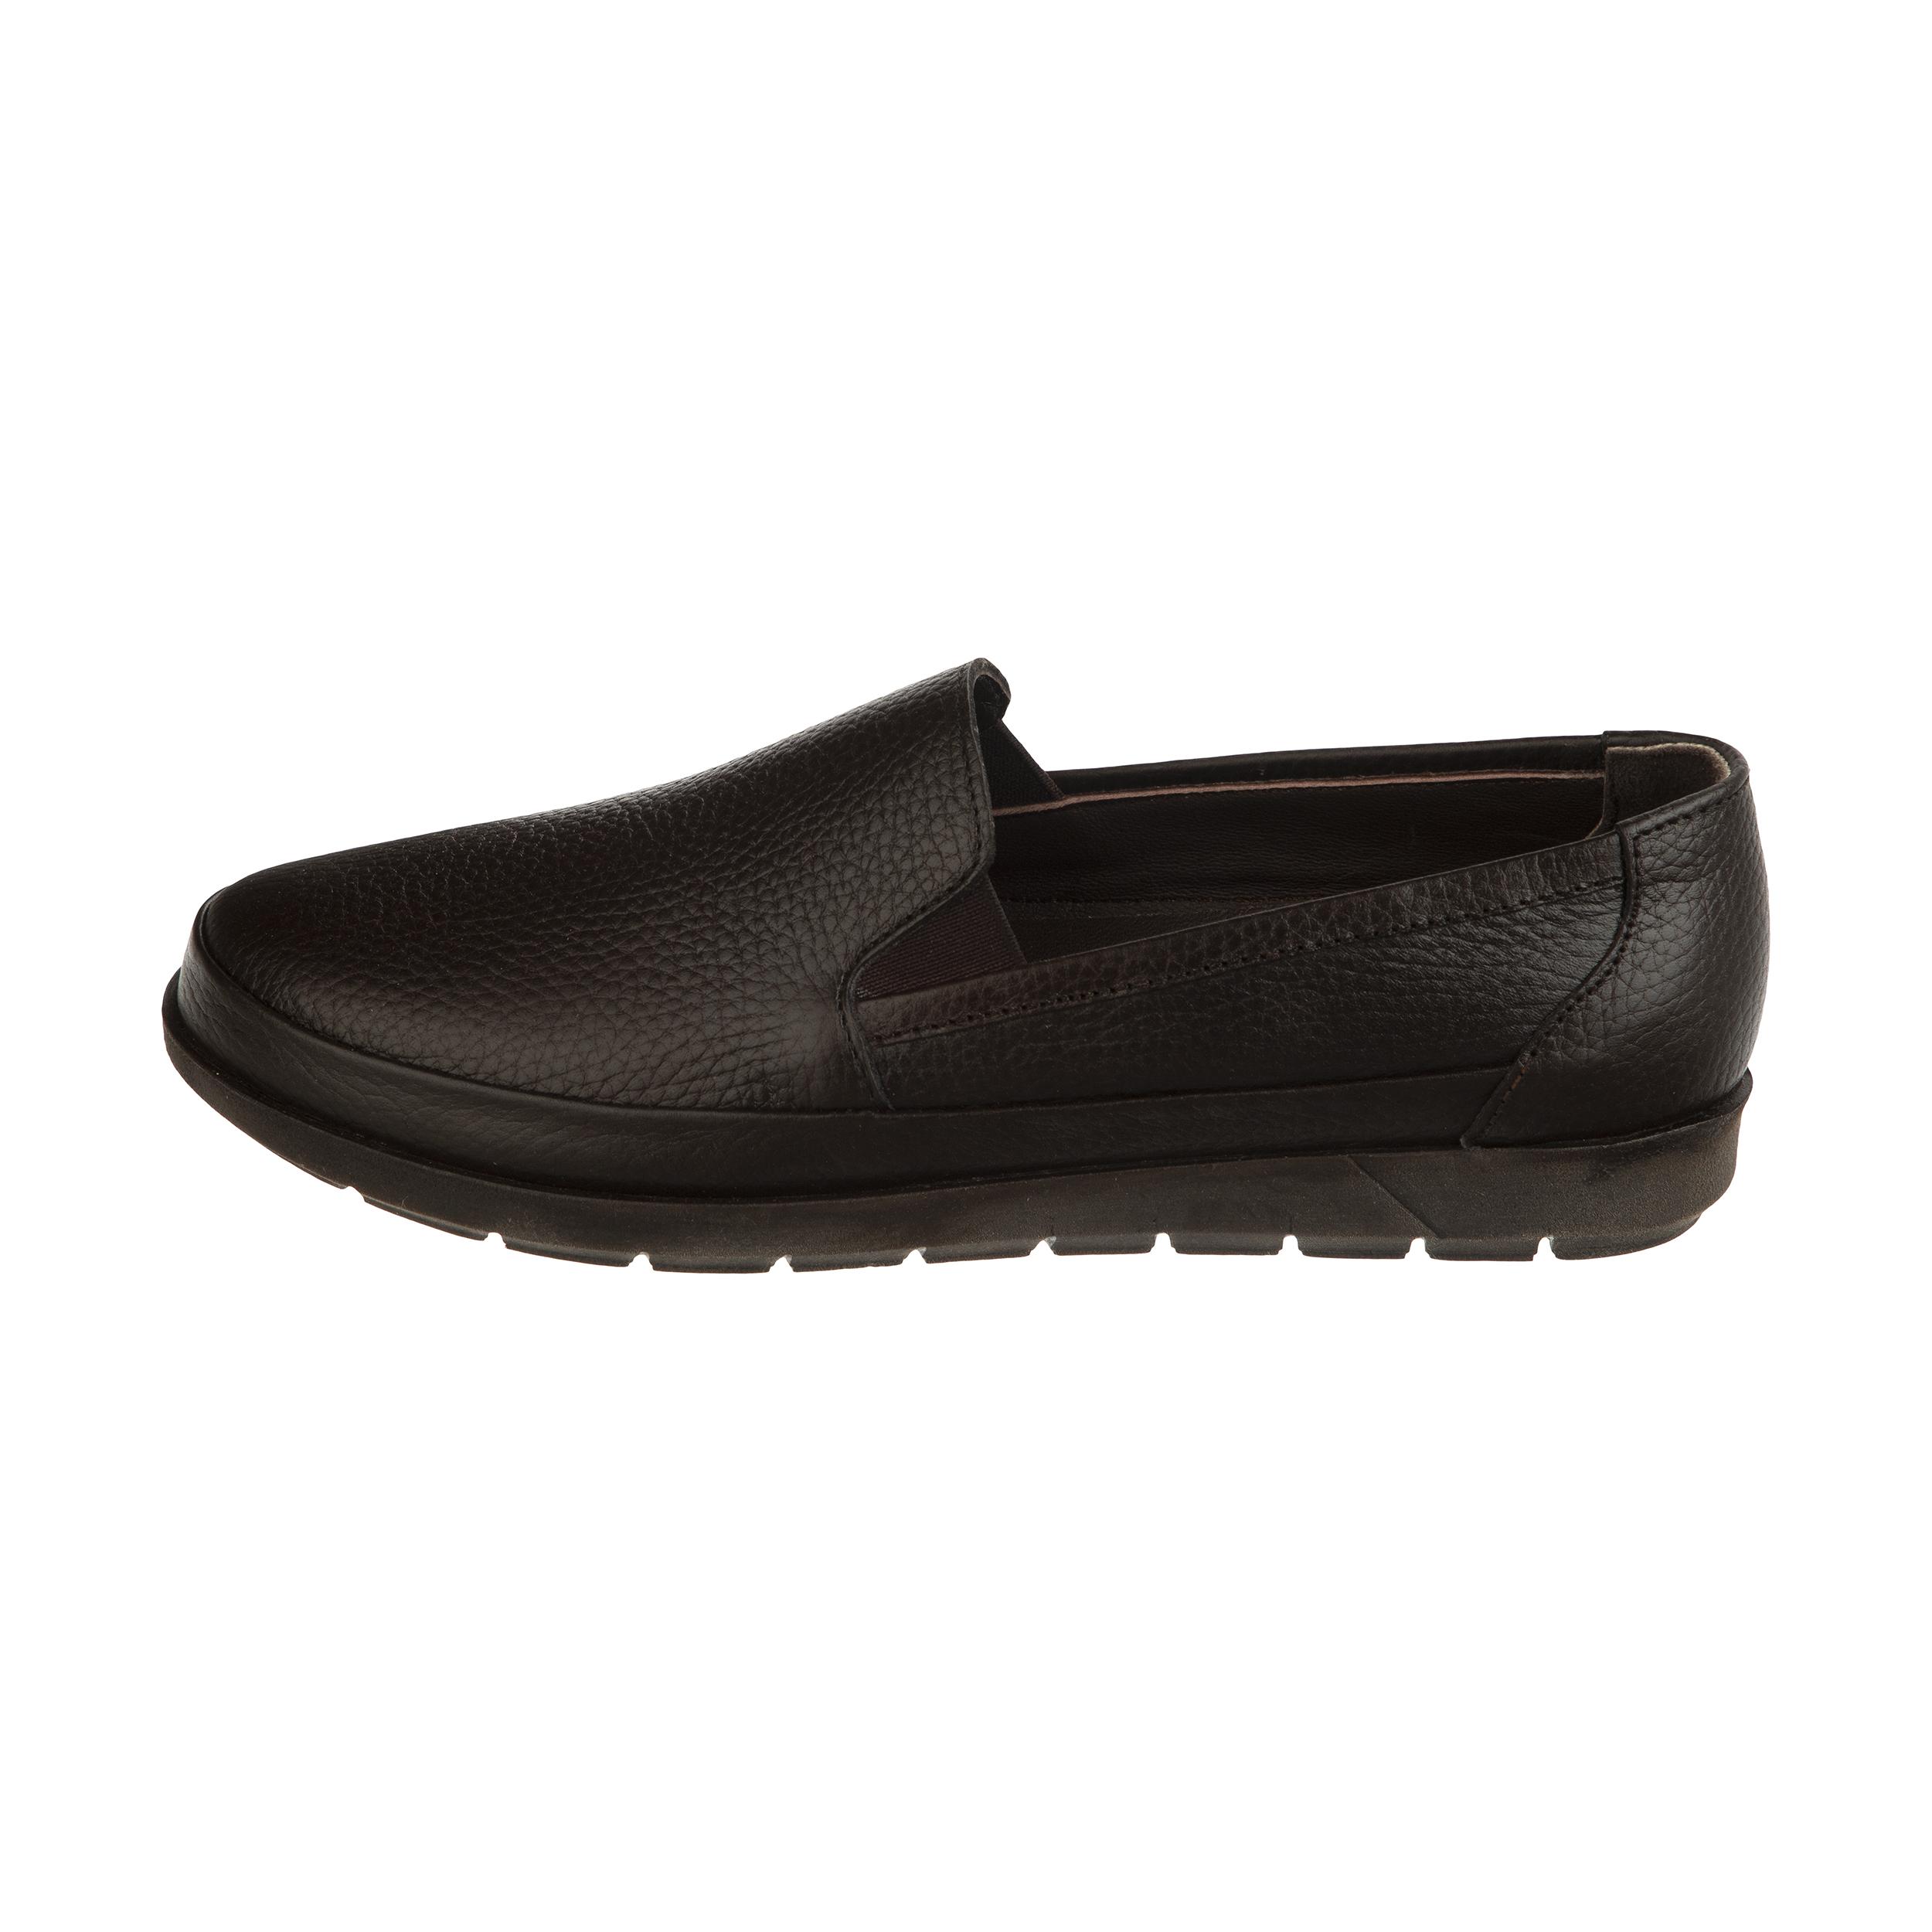 کفش روزمره زنانه شیفر مدل 5291A500104